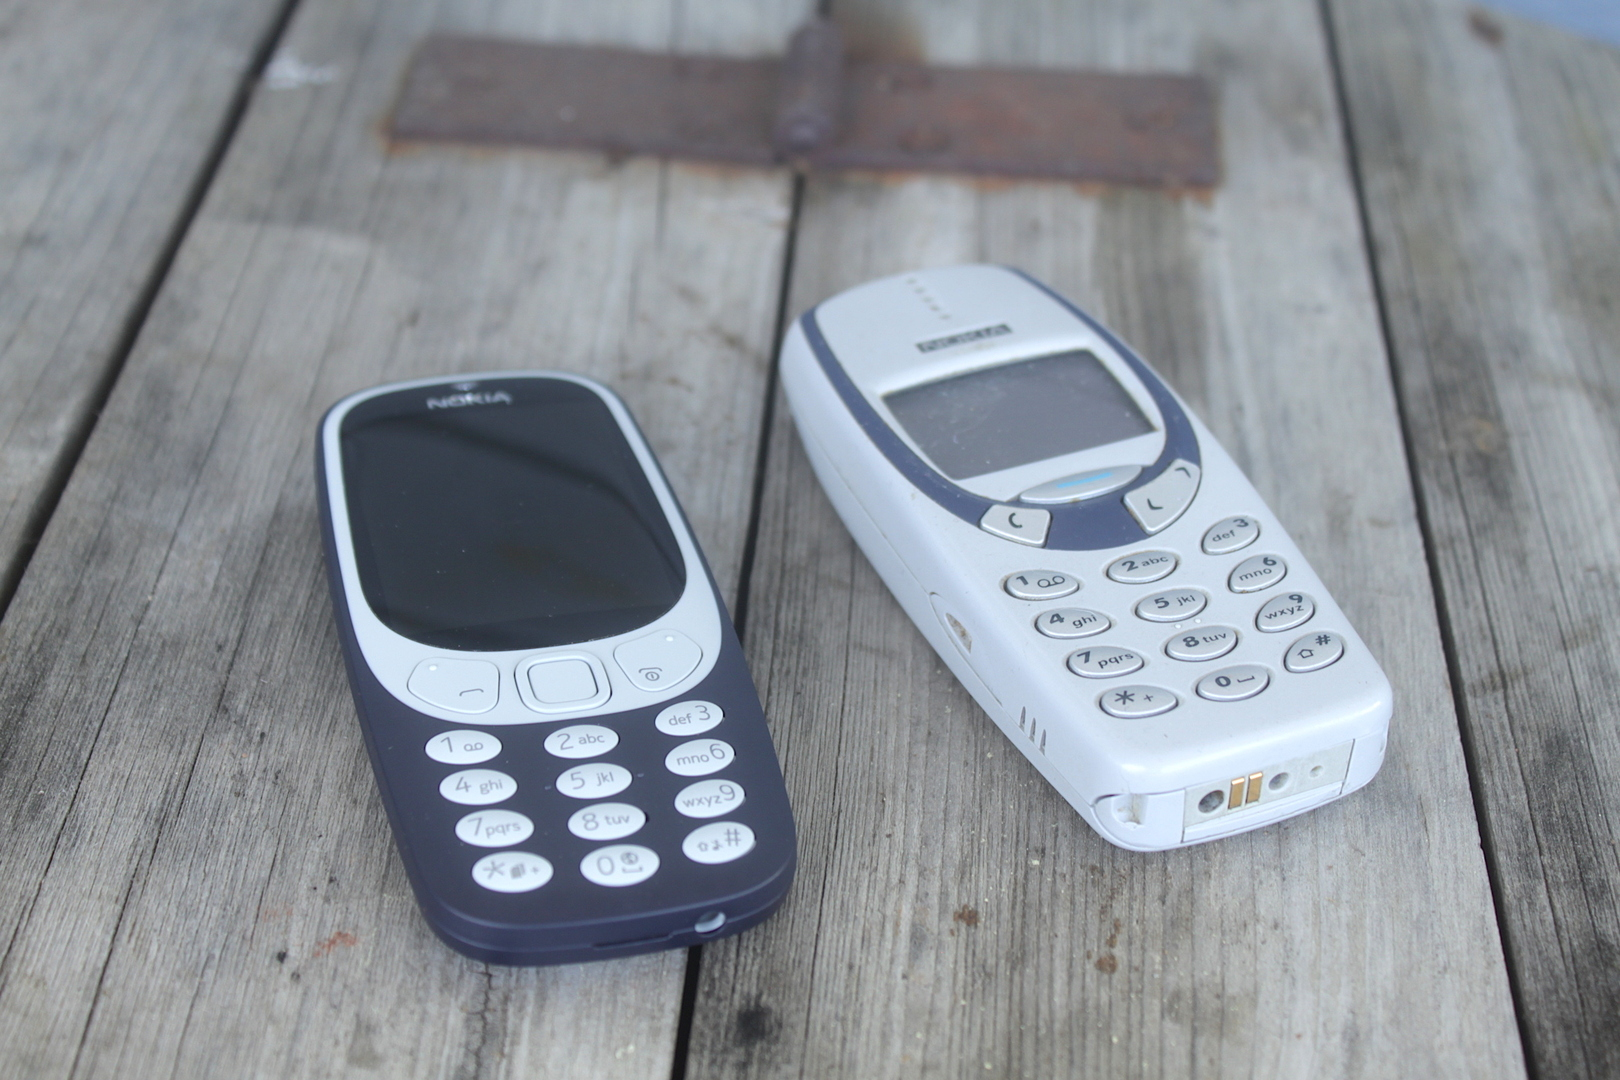 Nokia 3310 (2017) ja Nokia 3330